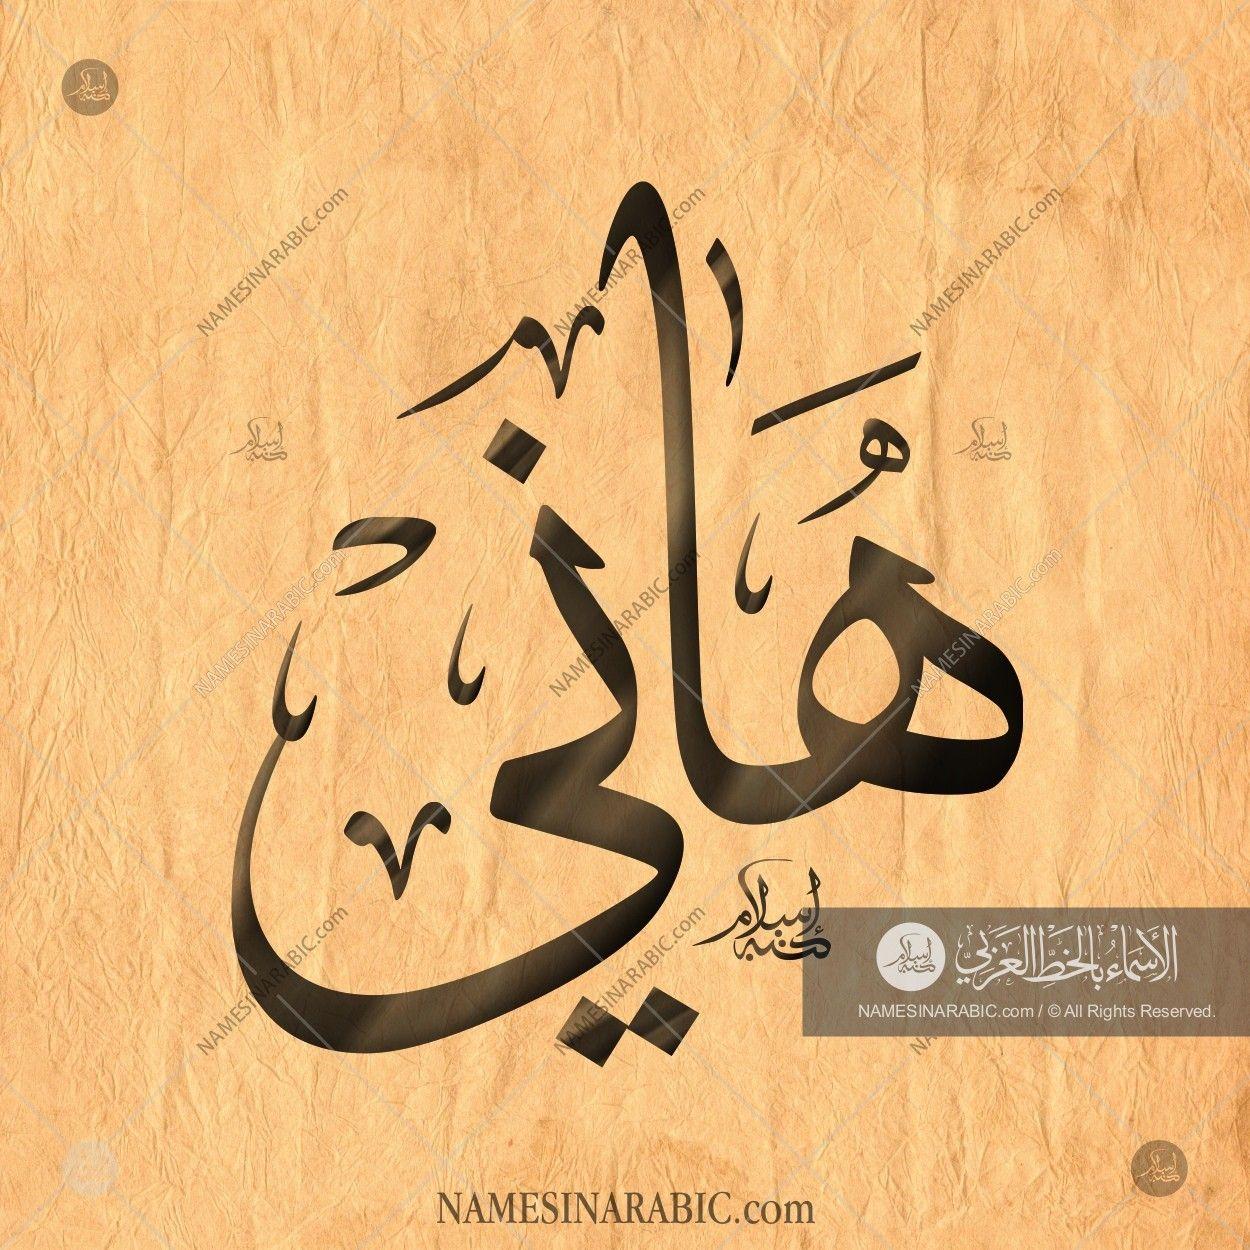 Hani هاني Names In Arabic Calligraphy Name 1871 Calligraphy Words Calligraphy Name Calligraphy